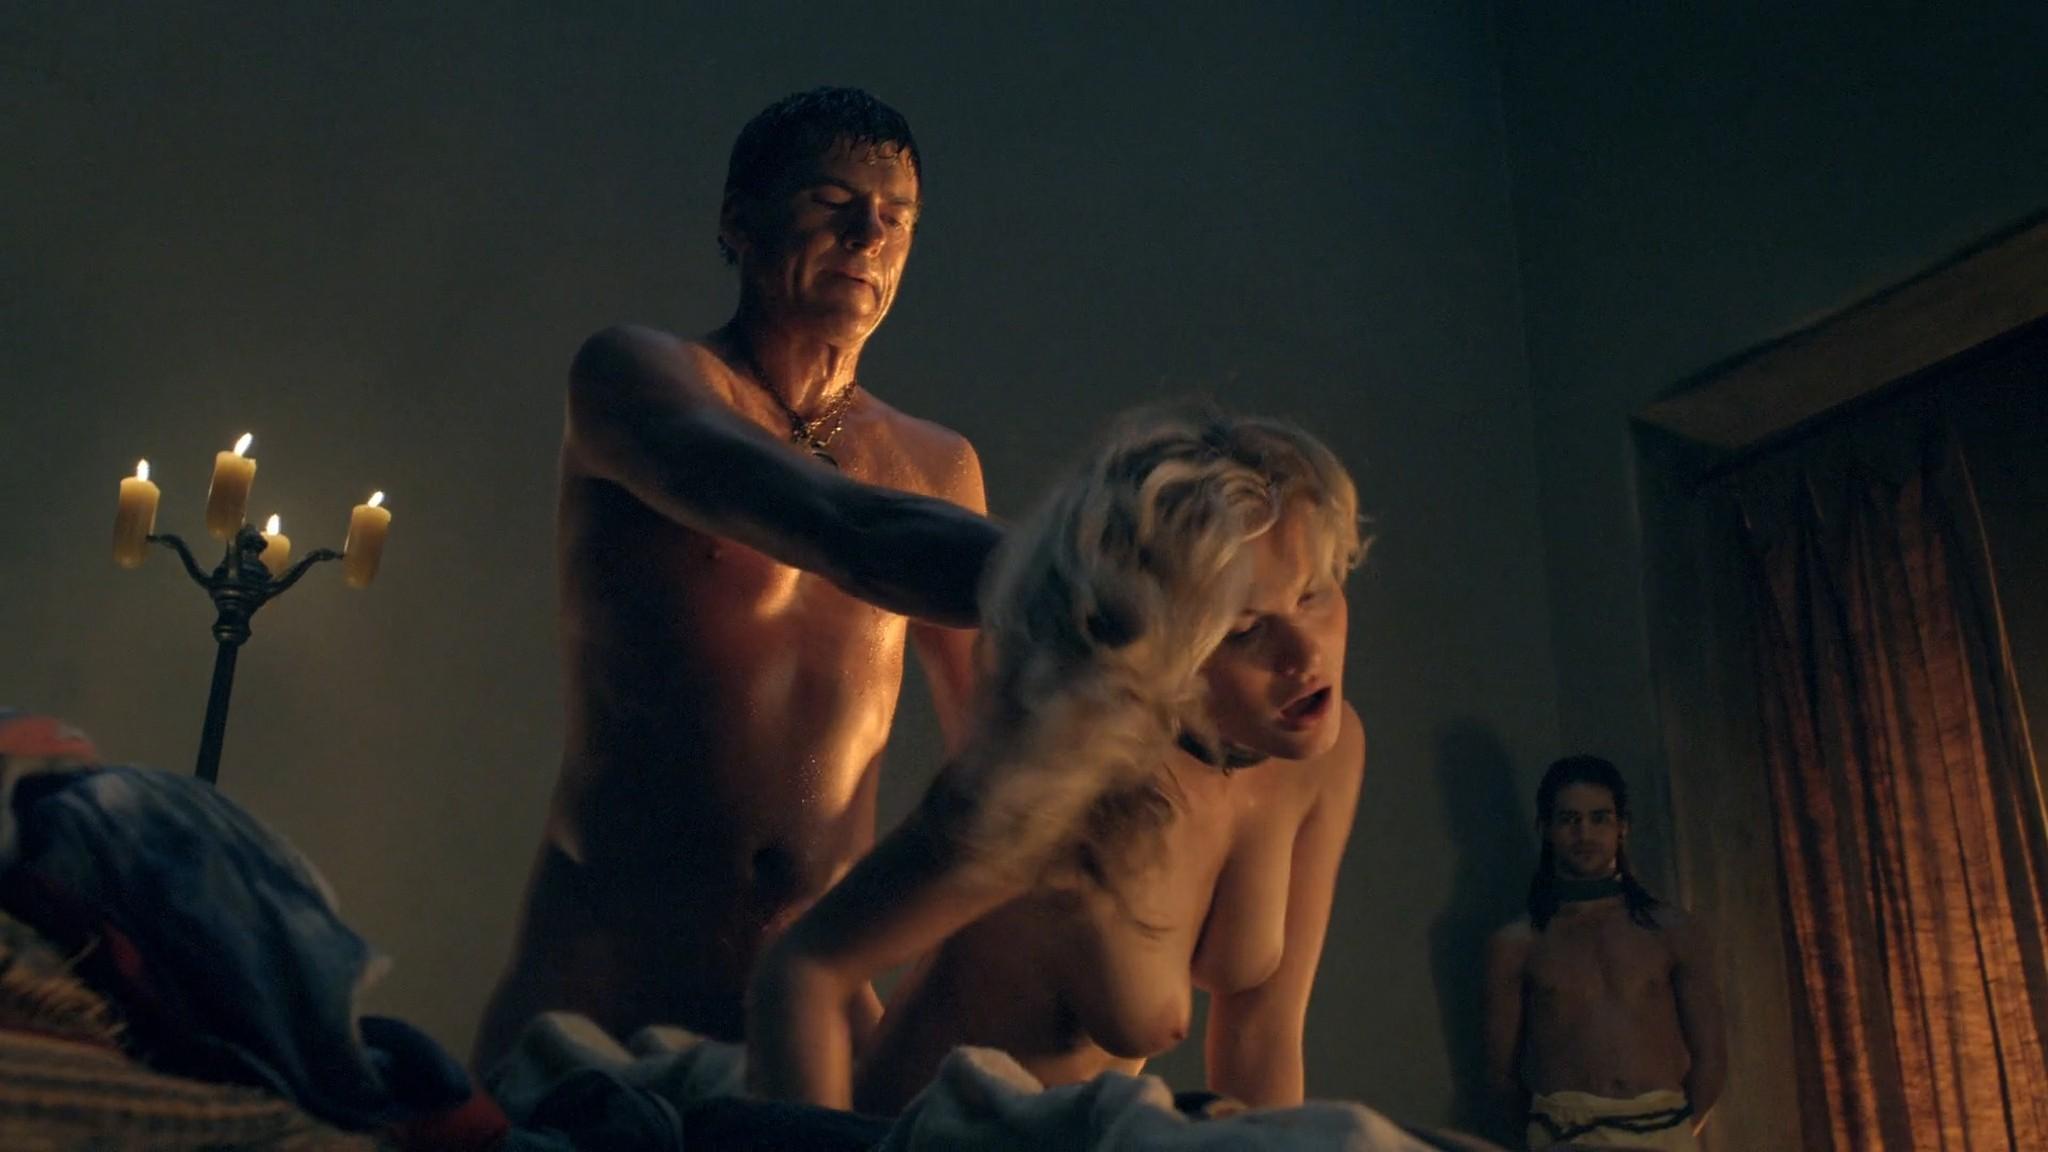 Viva Bianca nude Katrina Law, Bonnie Sveen all nude -Spartacus - Vengeance (2012) e2 1080p (13)